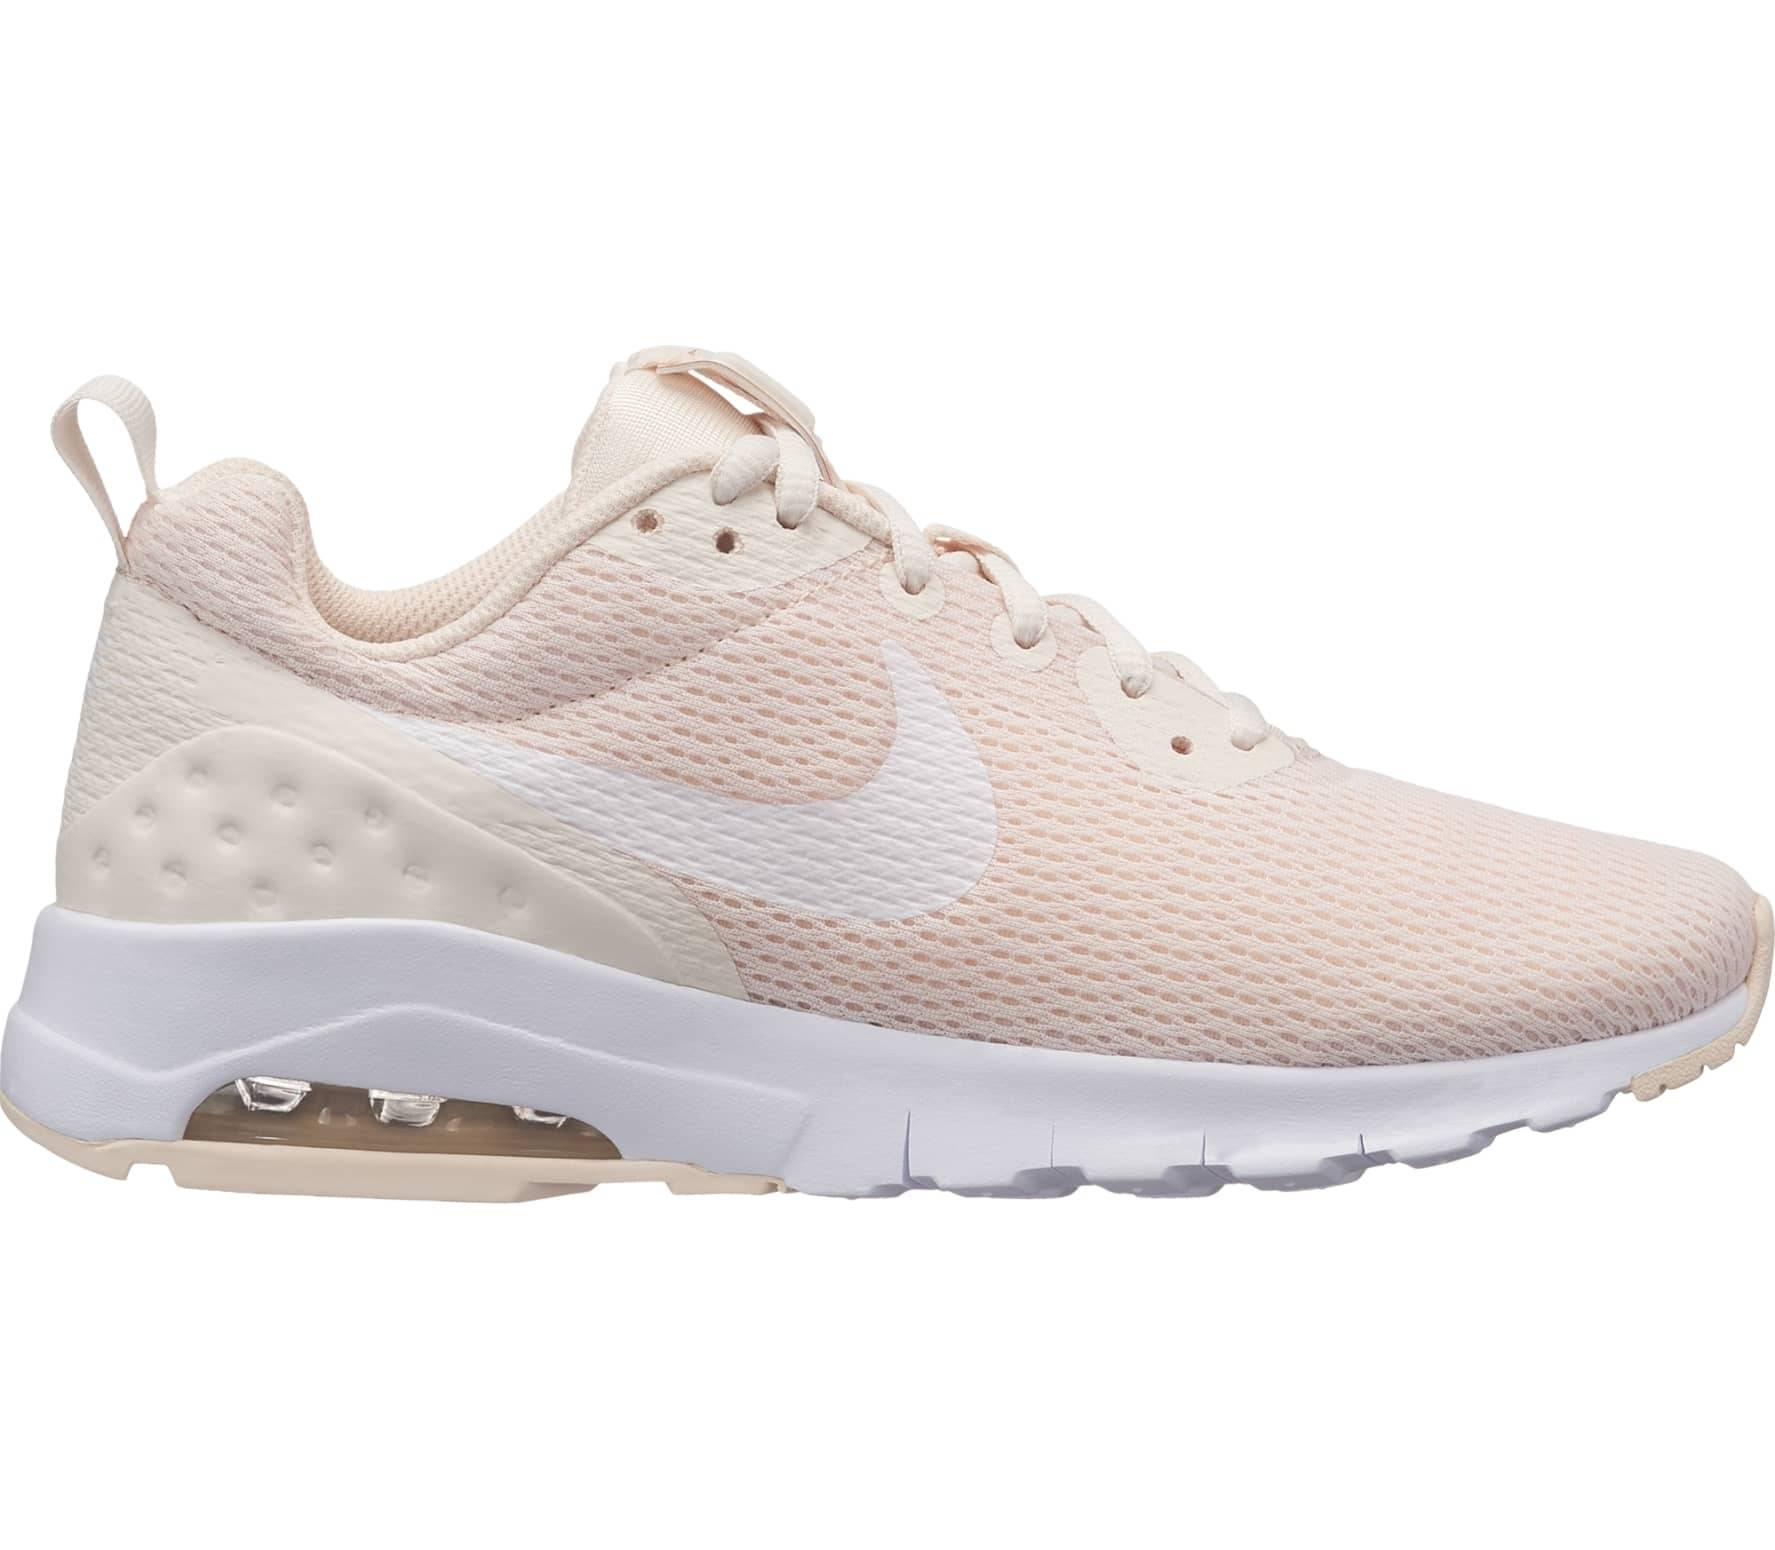 Nike Sportswear - AM16 UL Dam gymnastiksko (rosa) - EU 38,5 - US 7,5